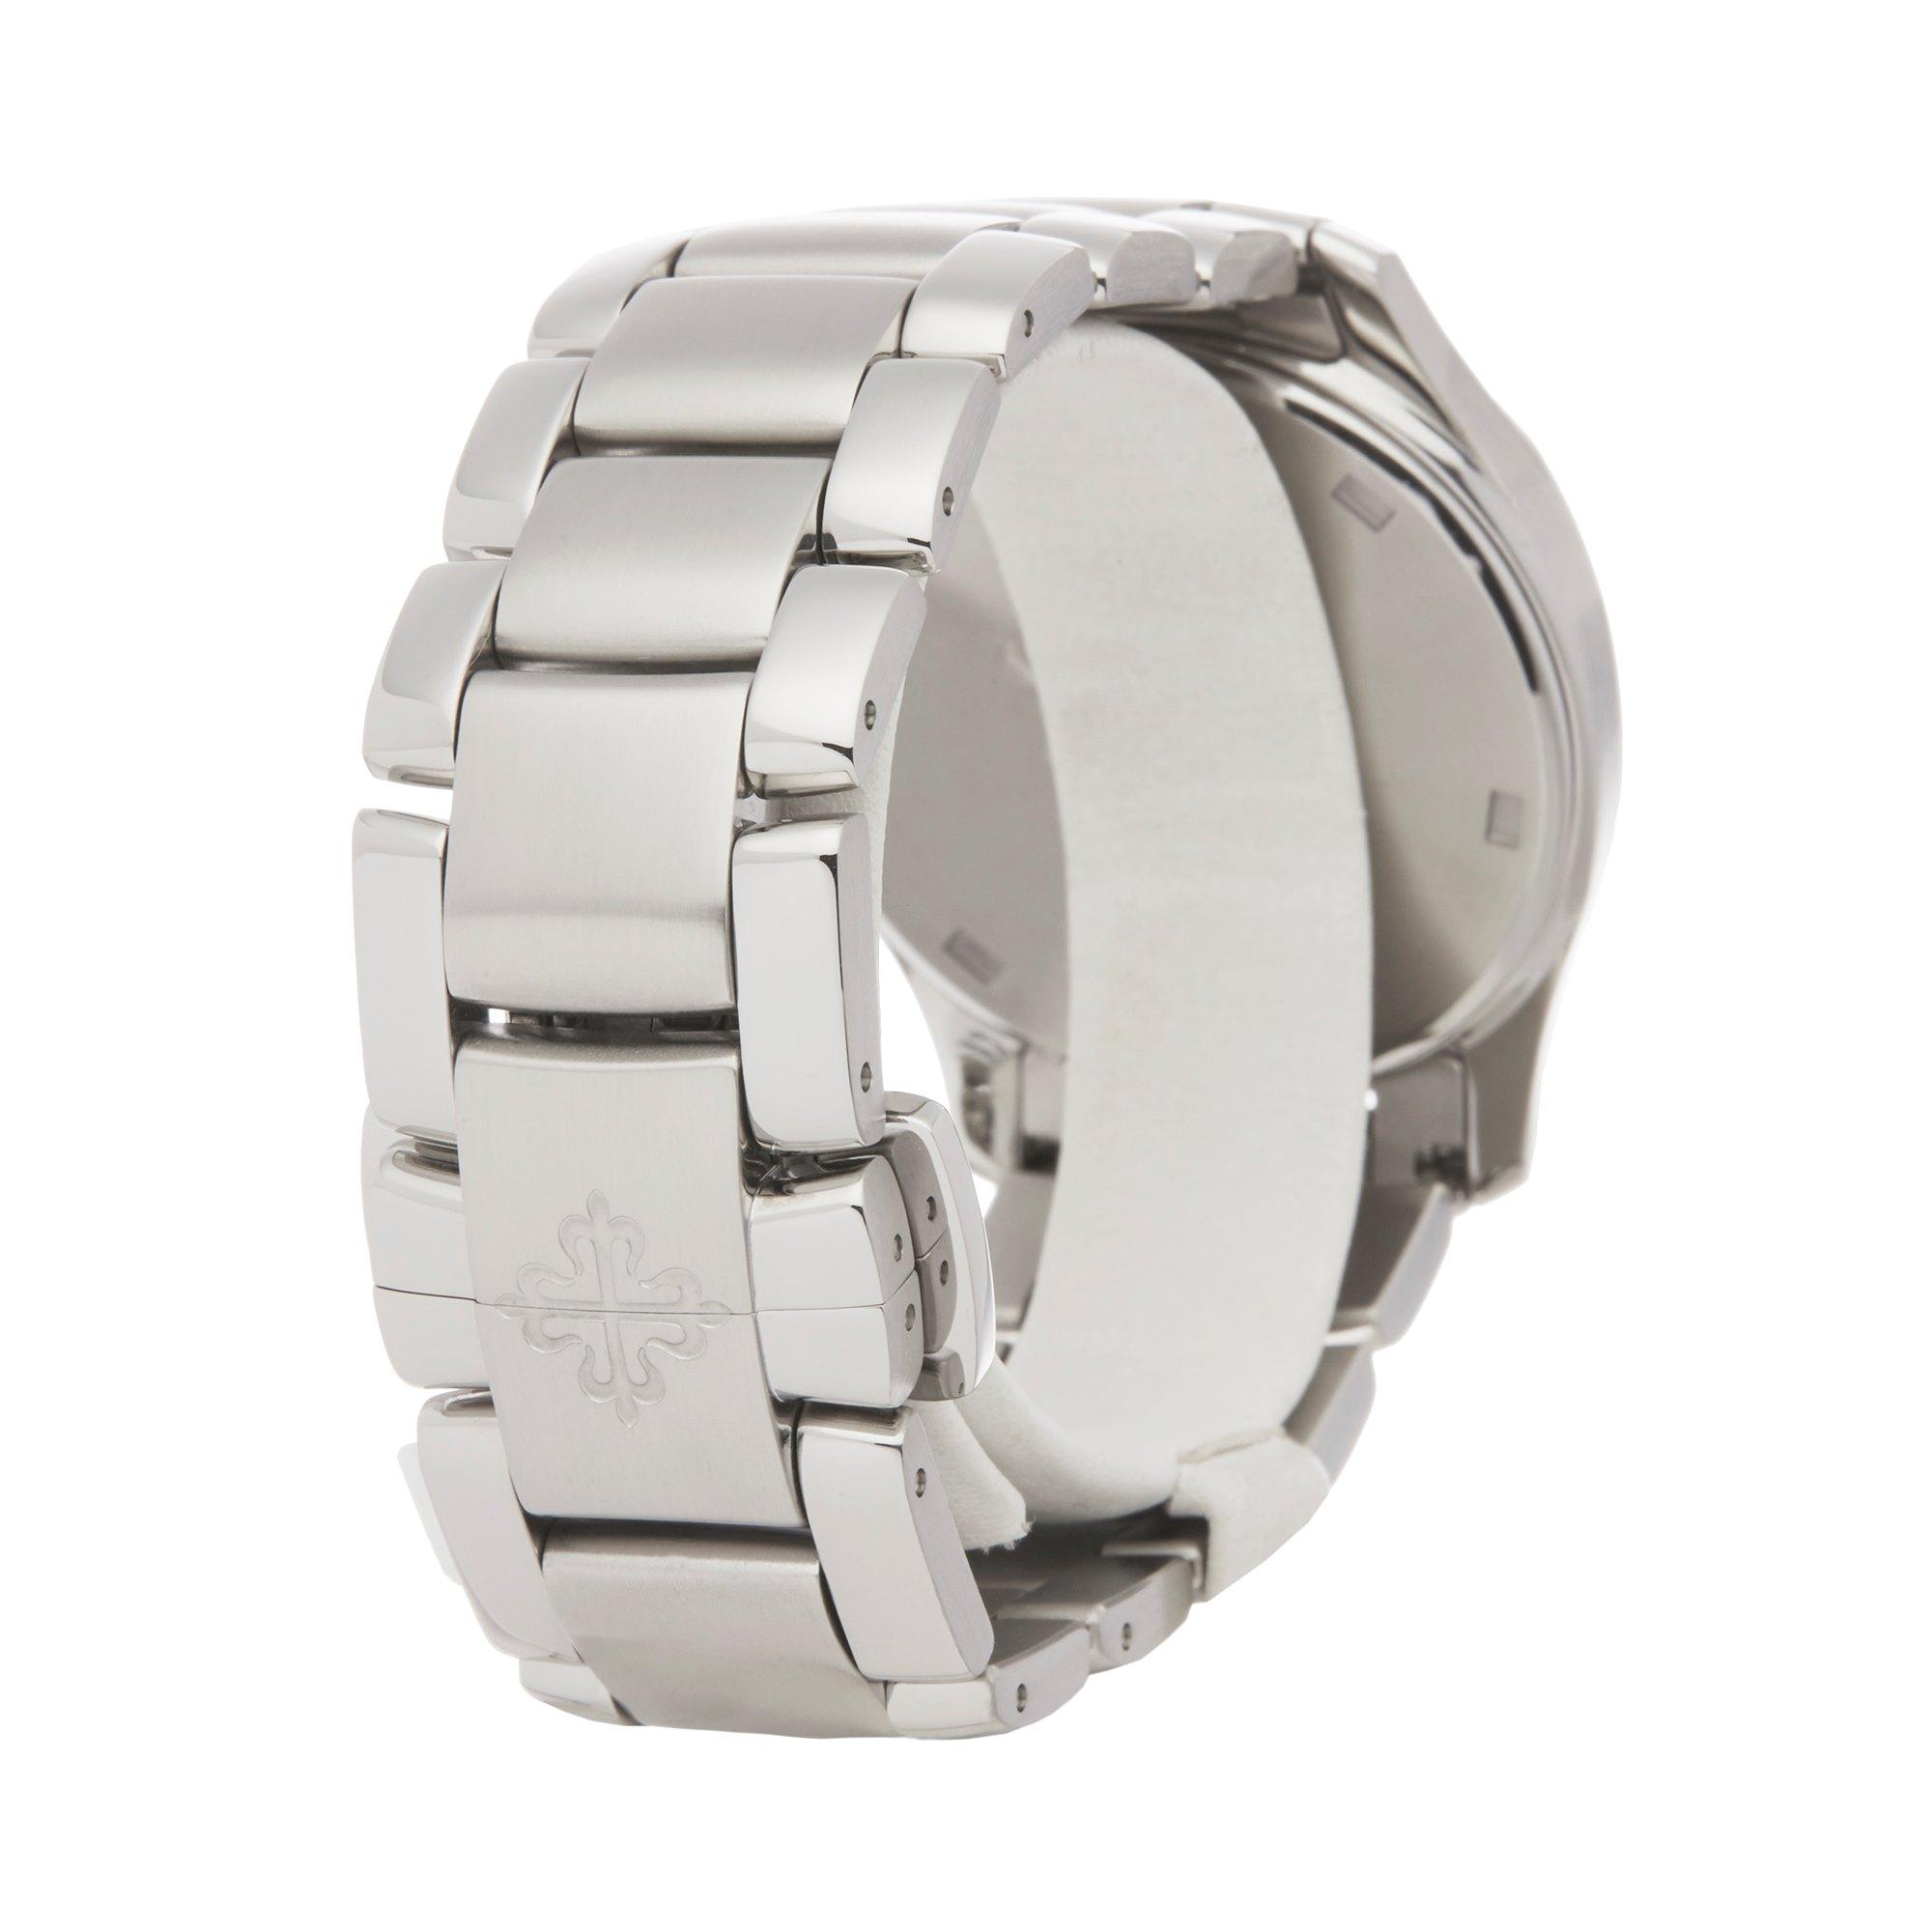 Patek Philippe Aquanaut Diamond Stainless Steel 5087/1A-010